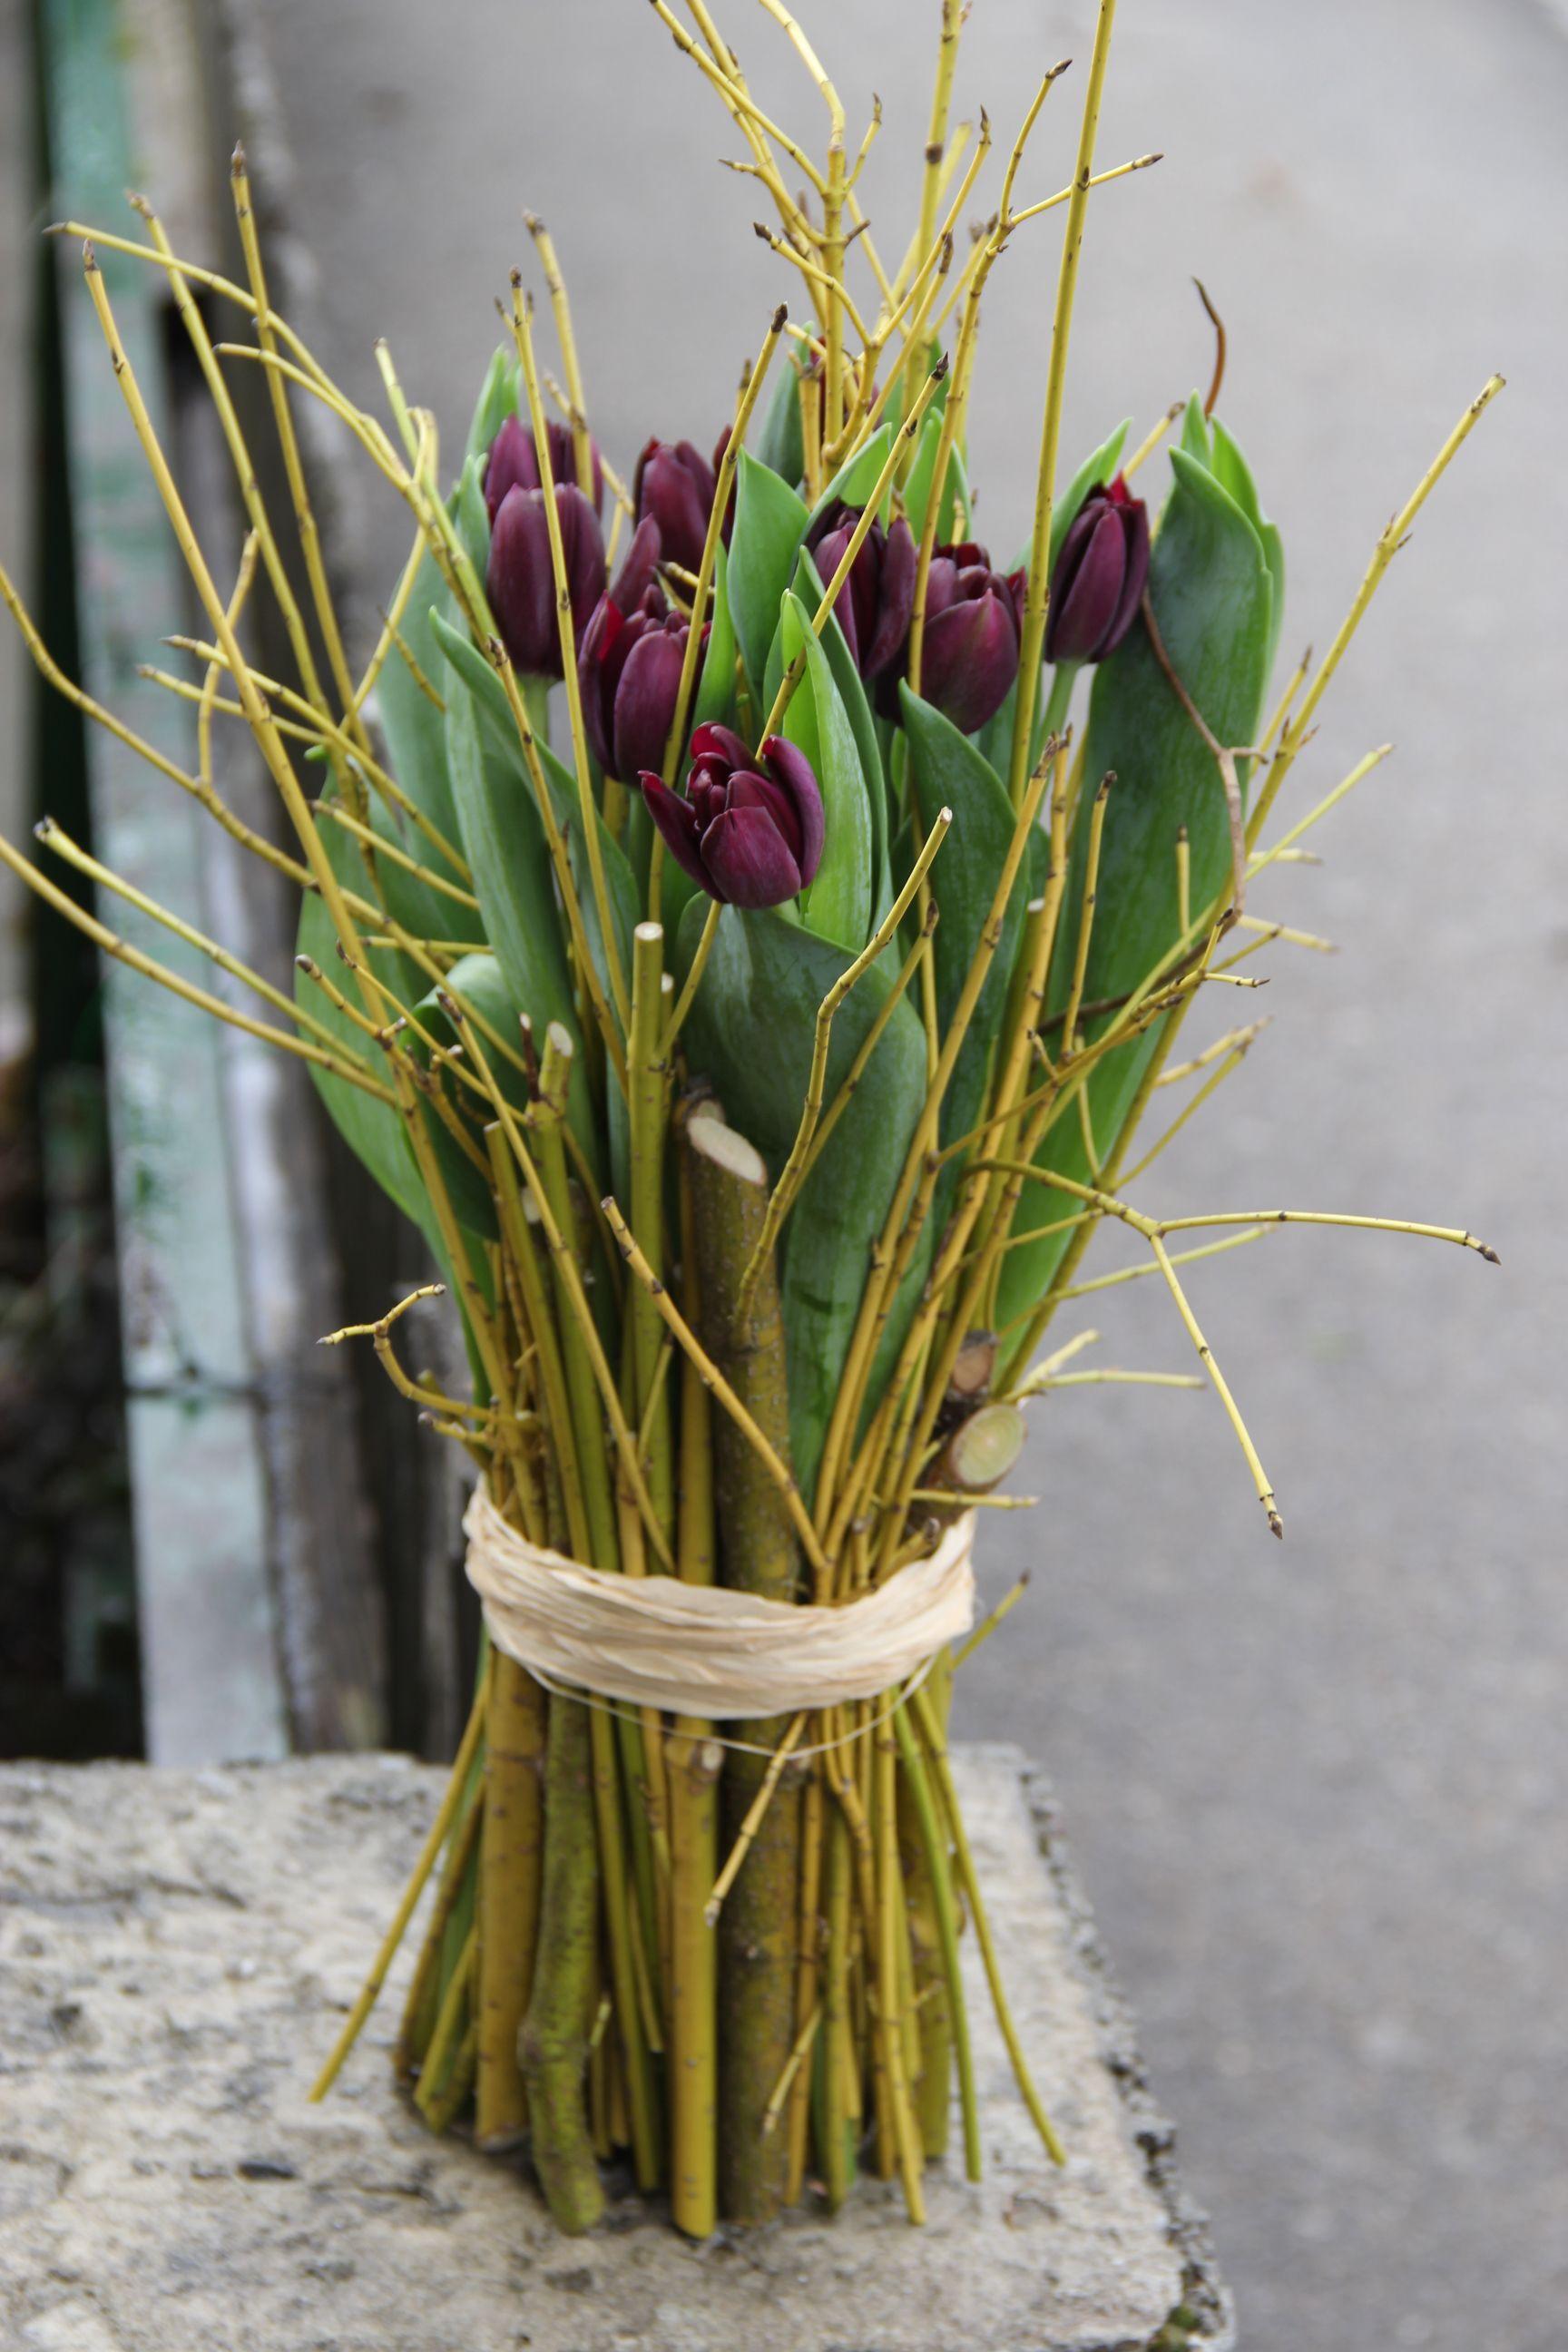 Exklusive Fruhlingsfloristik Violette Tulpen Zu Stehstrauss Arrangiert Blumenarrangements Einfach Moderne Blumenarrangements Tulpen